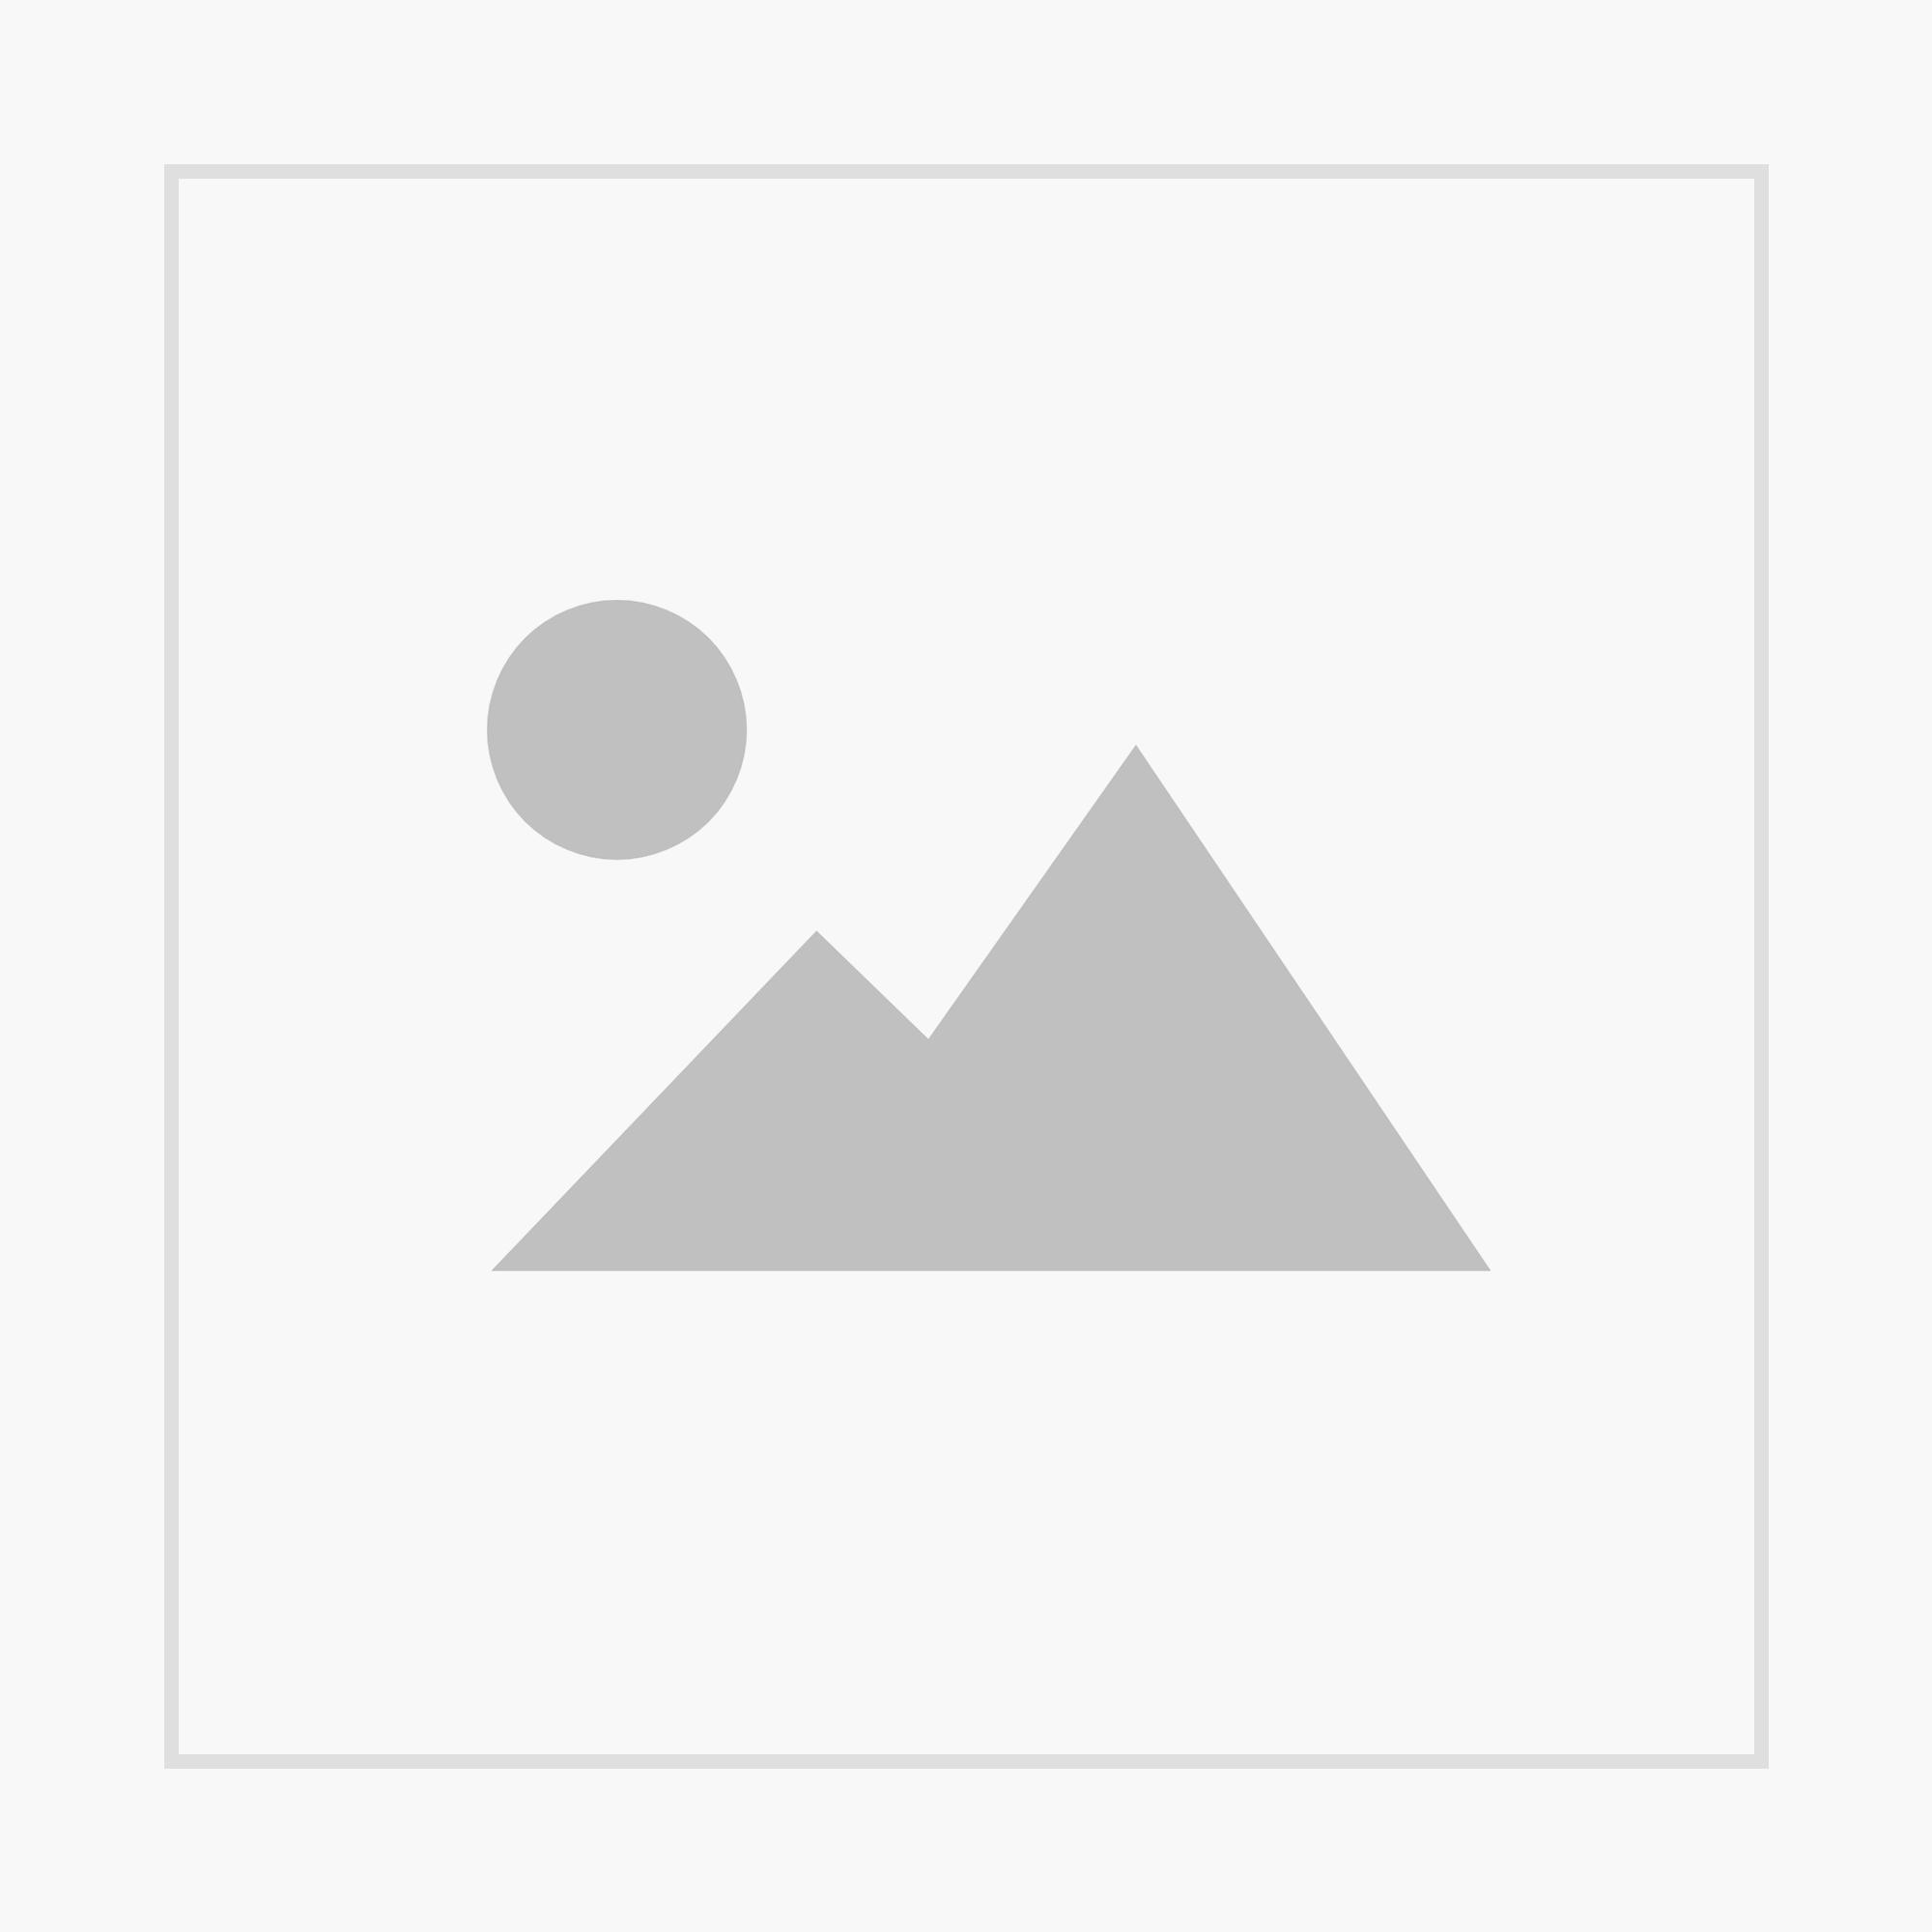 Land & Berge 5/2019